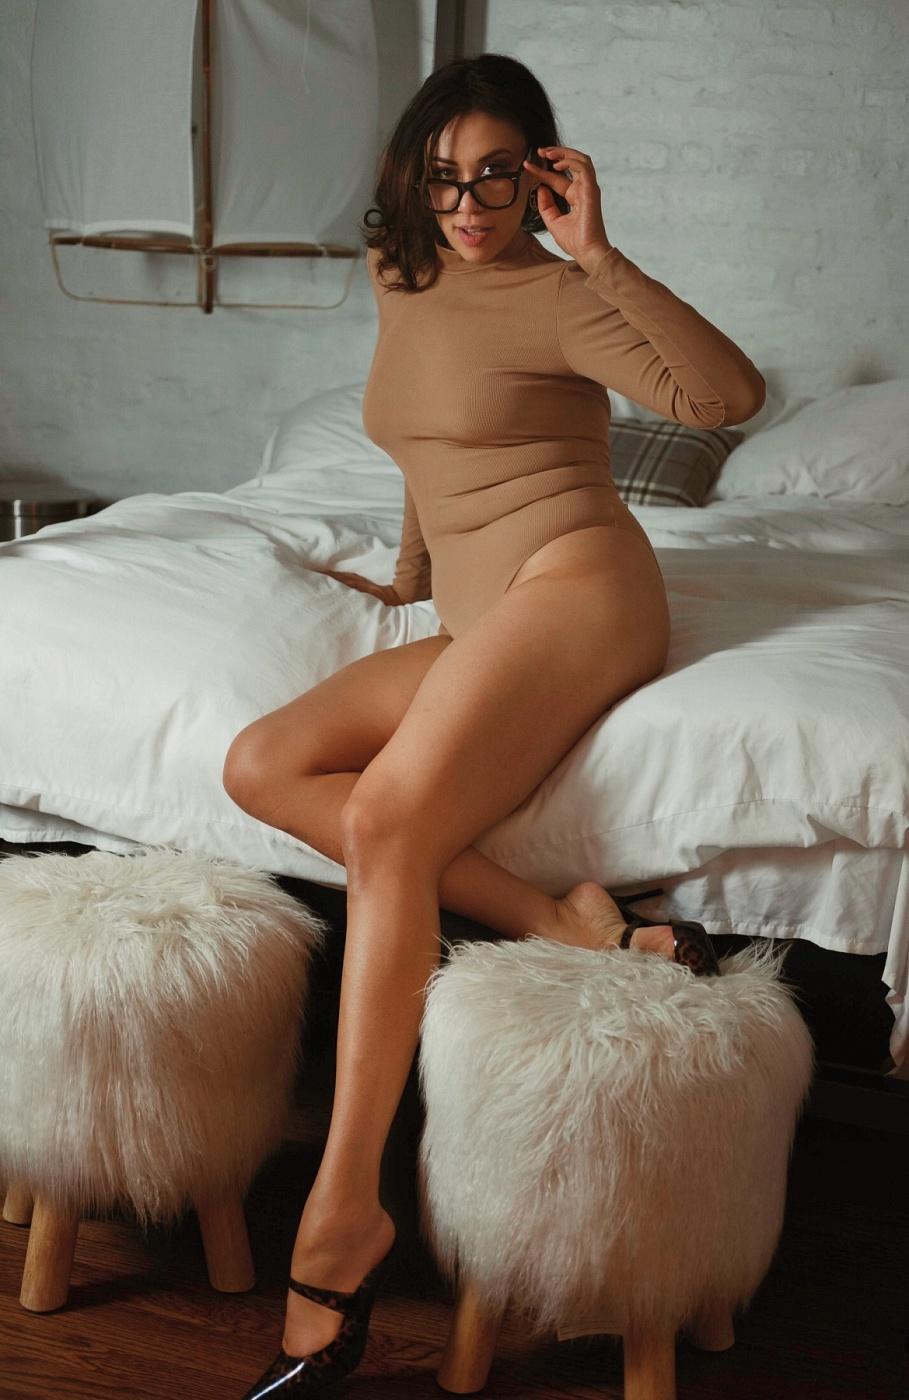 Maxienne Robey